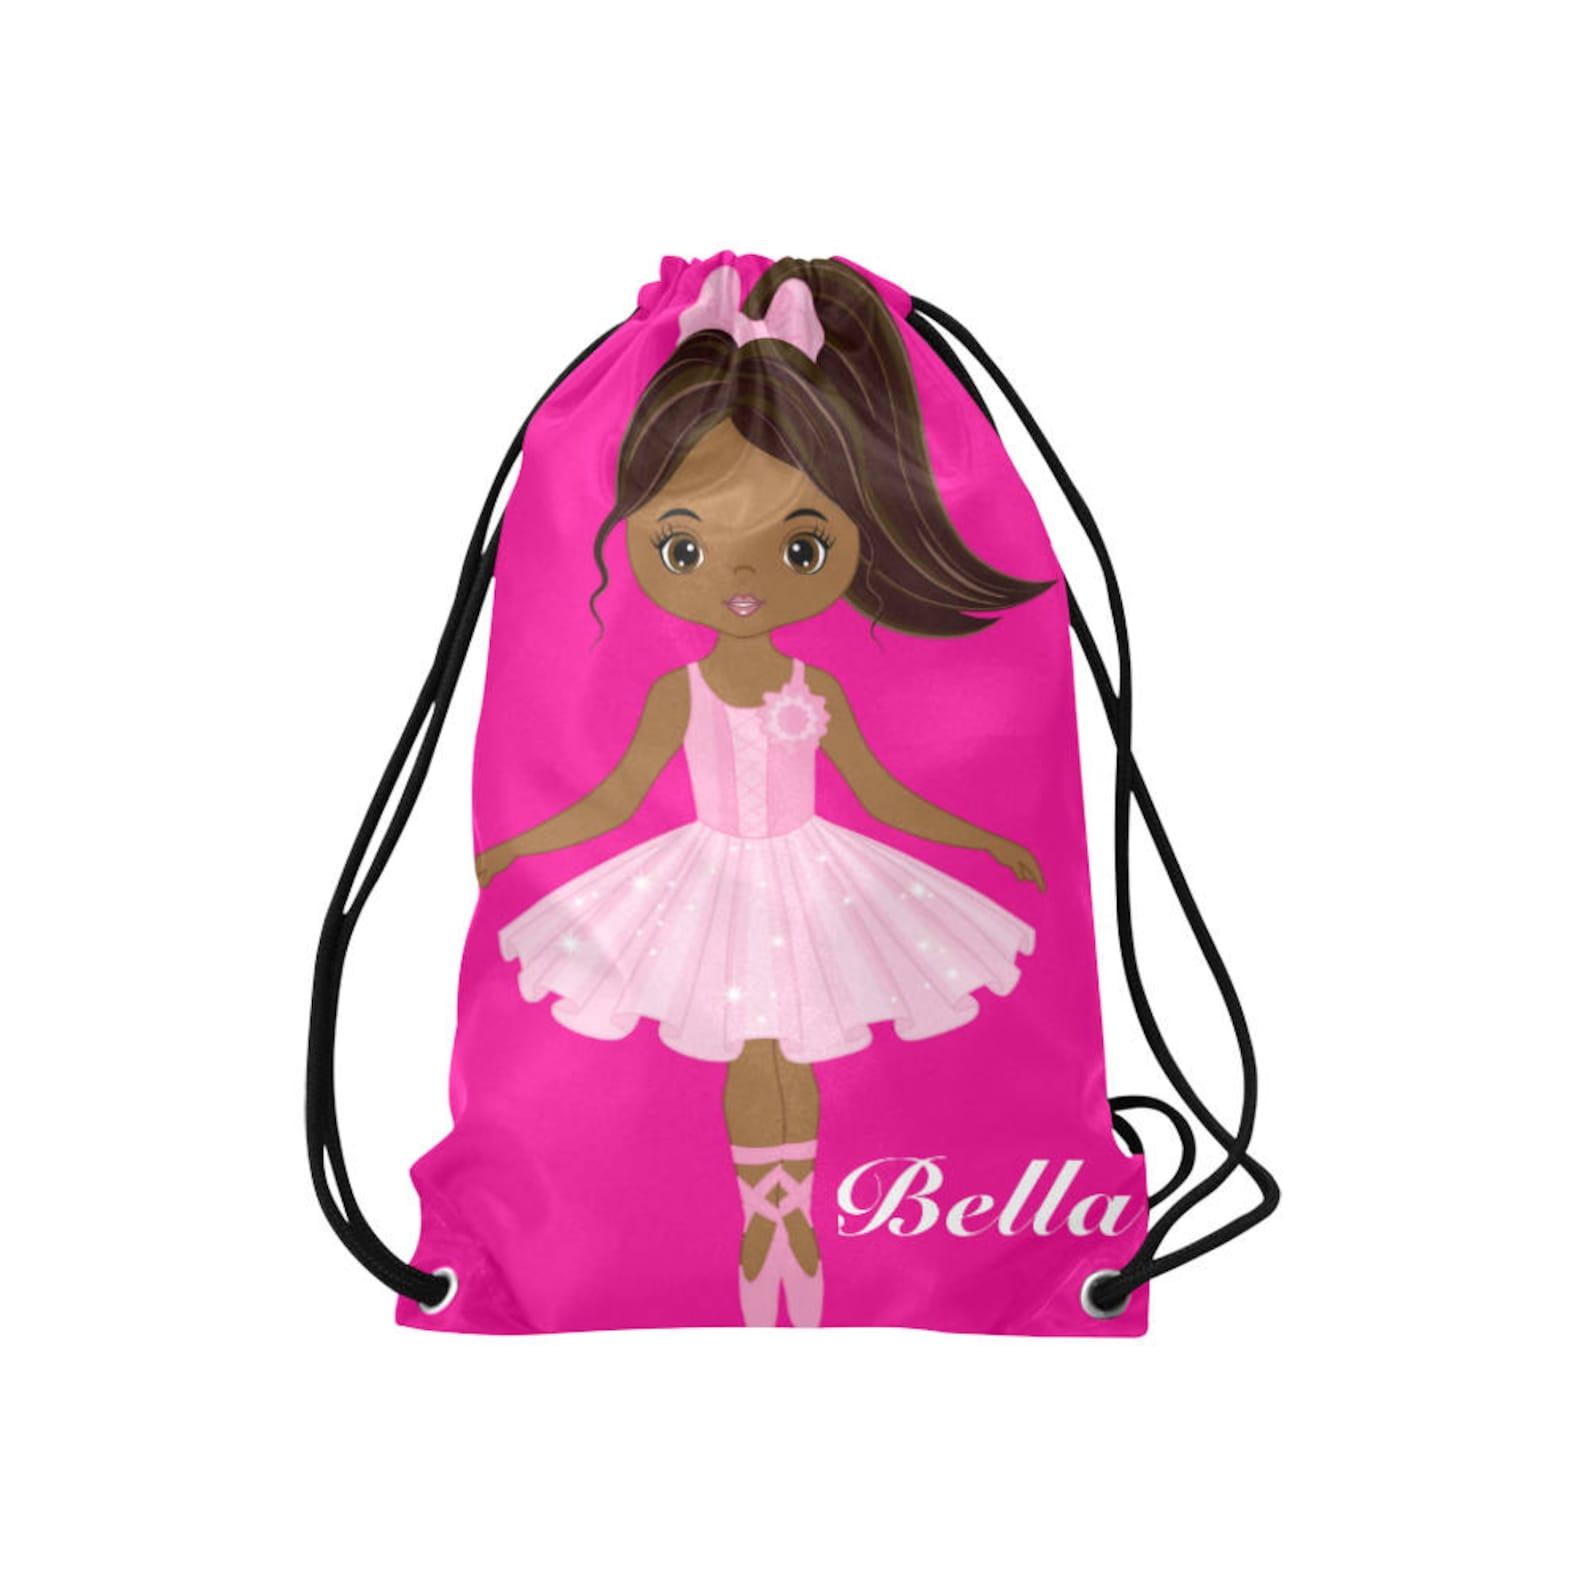 personalized drawstring backpack - girls dance bag- ballerina backpack for girls - ballet dance bag - ballet cinch sack - ballet